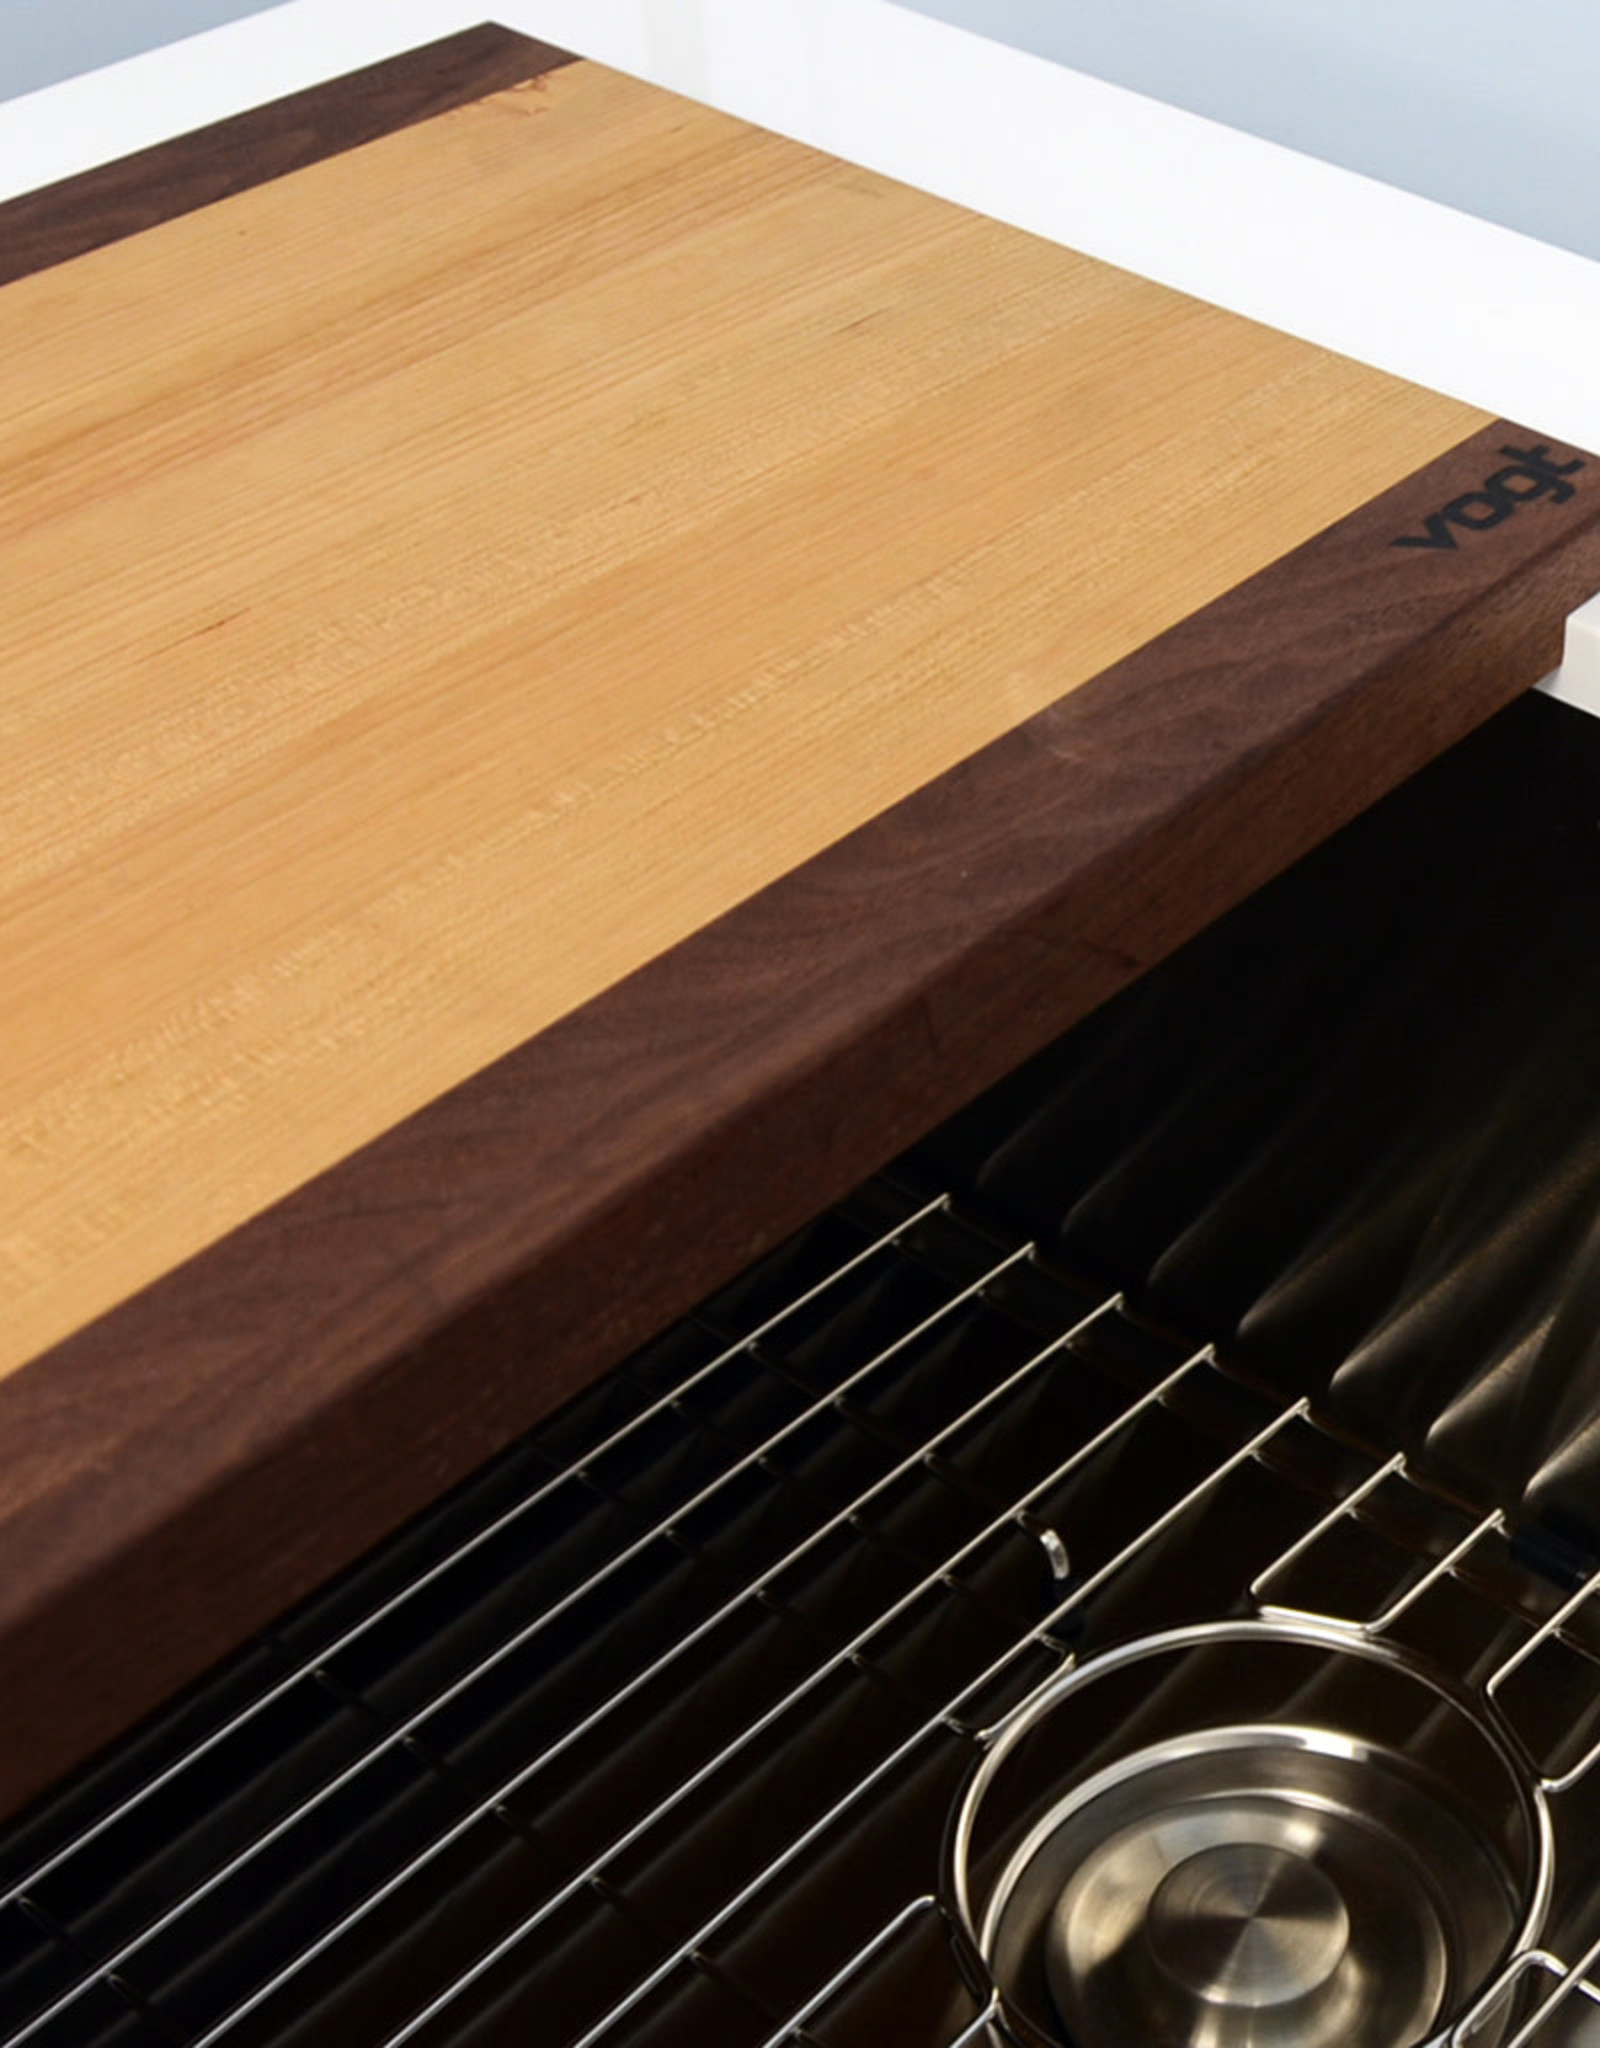 Vogt Cutting Board